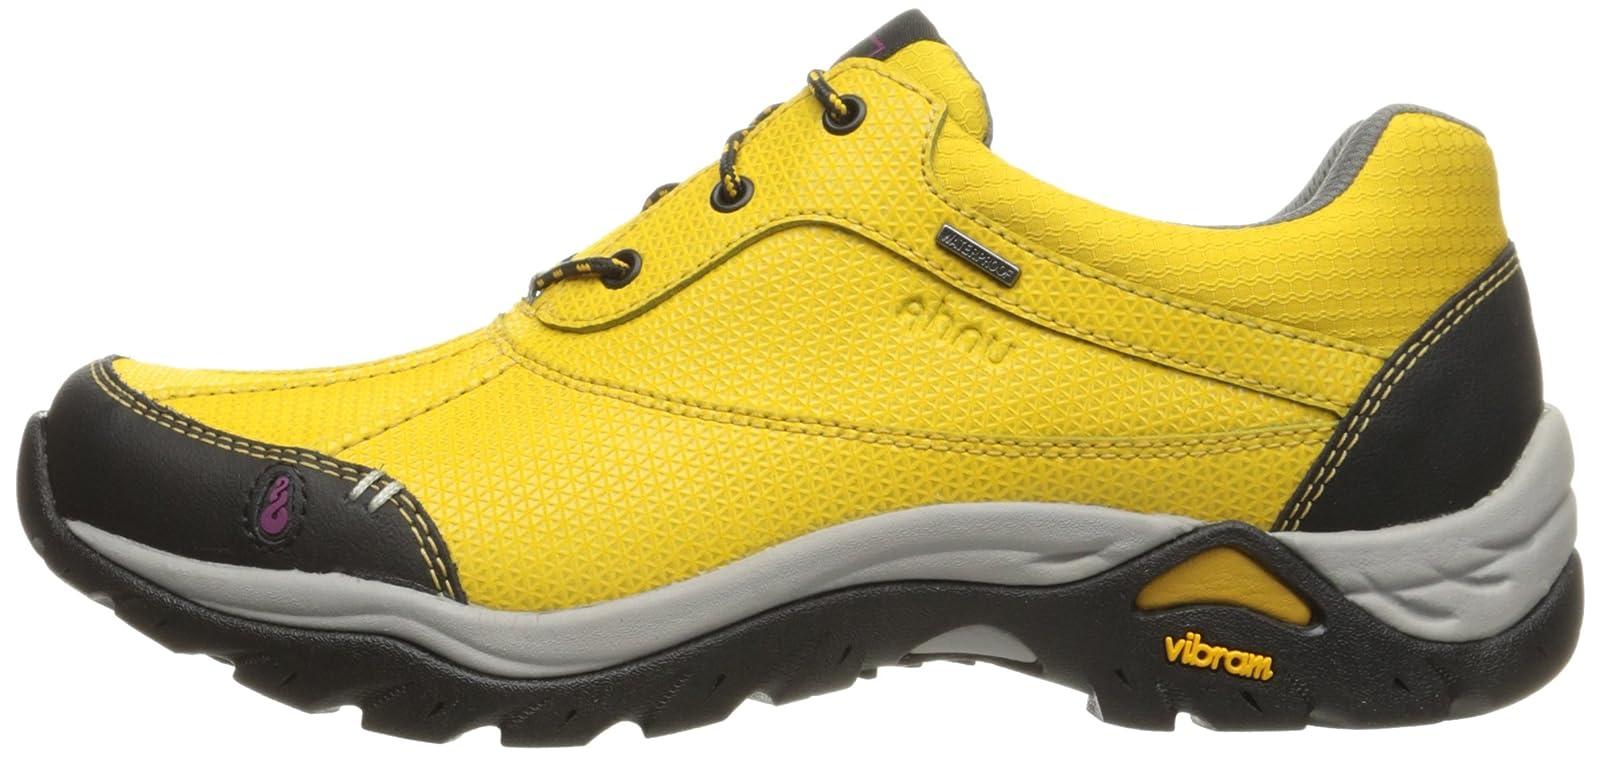 Ahnu Women's Calaveras Waterproof Hiking Shoe 5 M US - 5